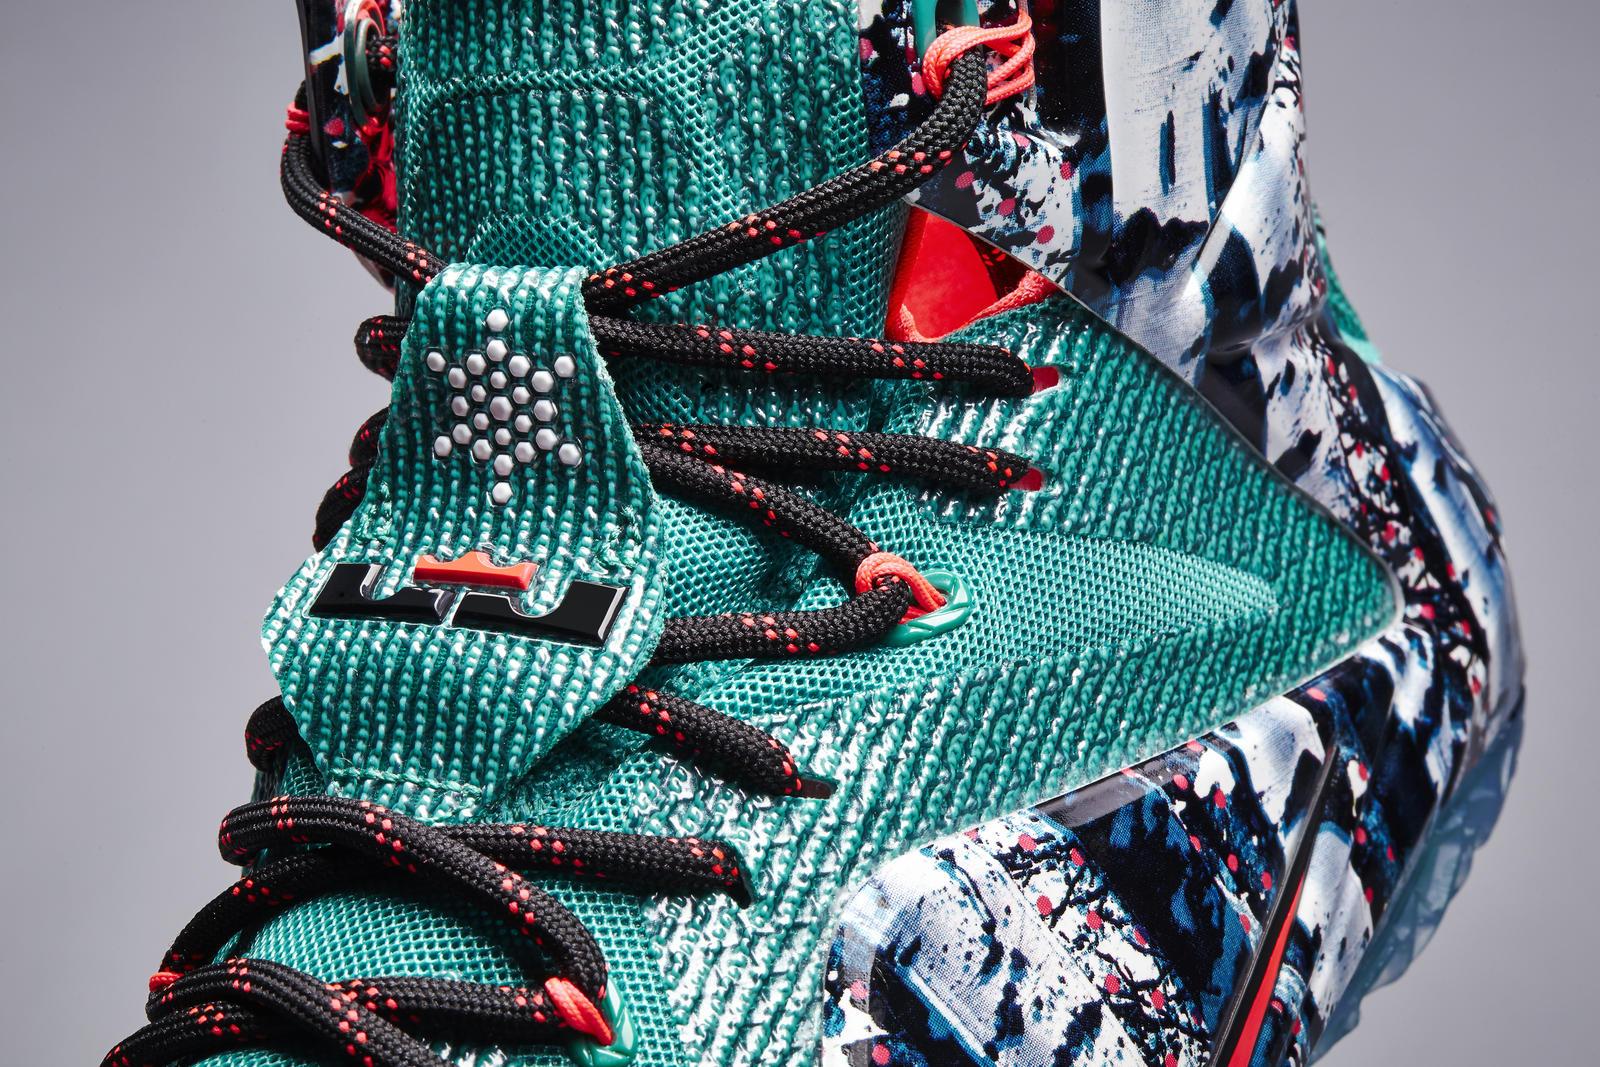 PHOTOS: Nike Christmas kicks for LeBron, Kobe, KD - CBSSports.com